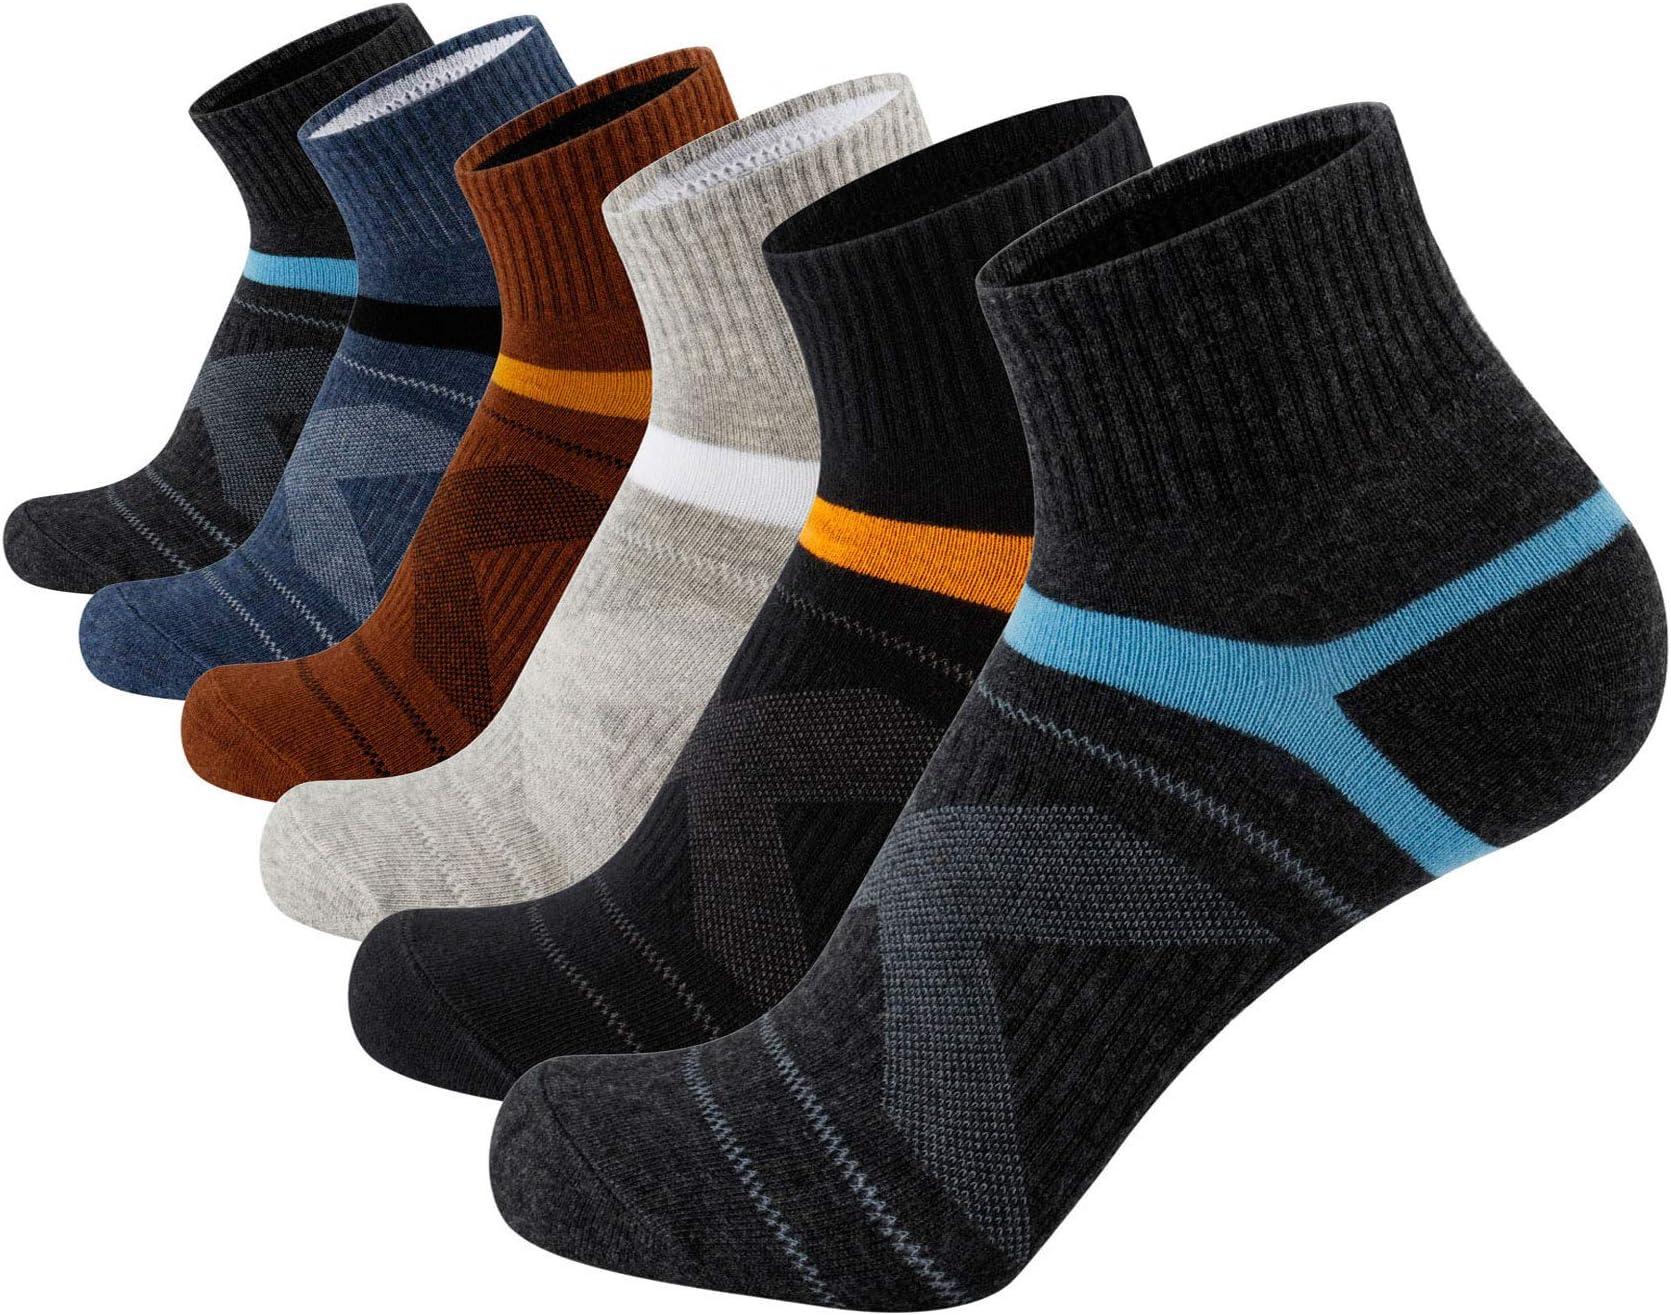 Womens /& Mens Low Cut Socks,DIBAOLONG 6-Pair Ankle No Show Athletic Short Cotton Socks